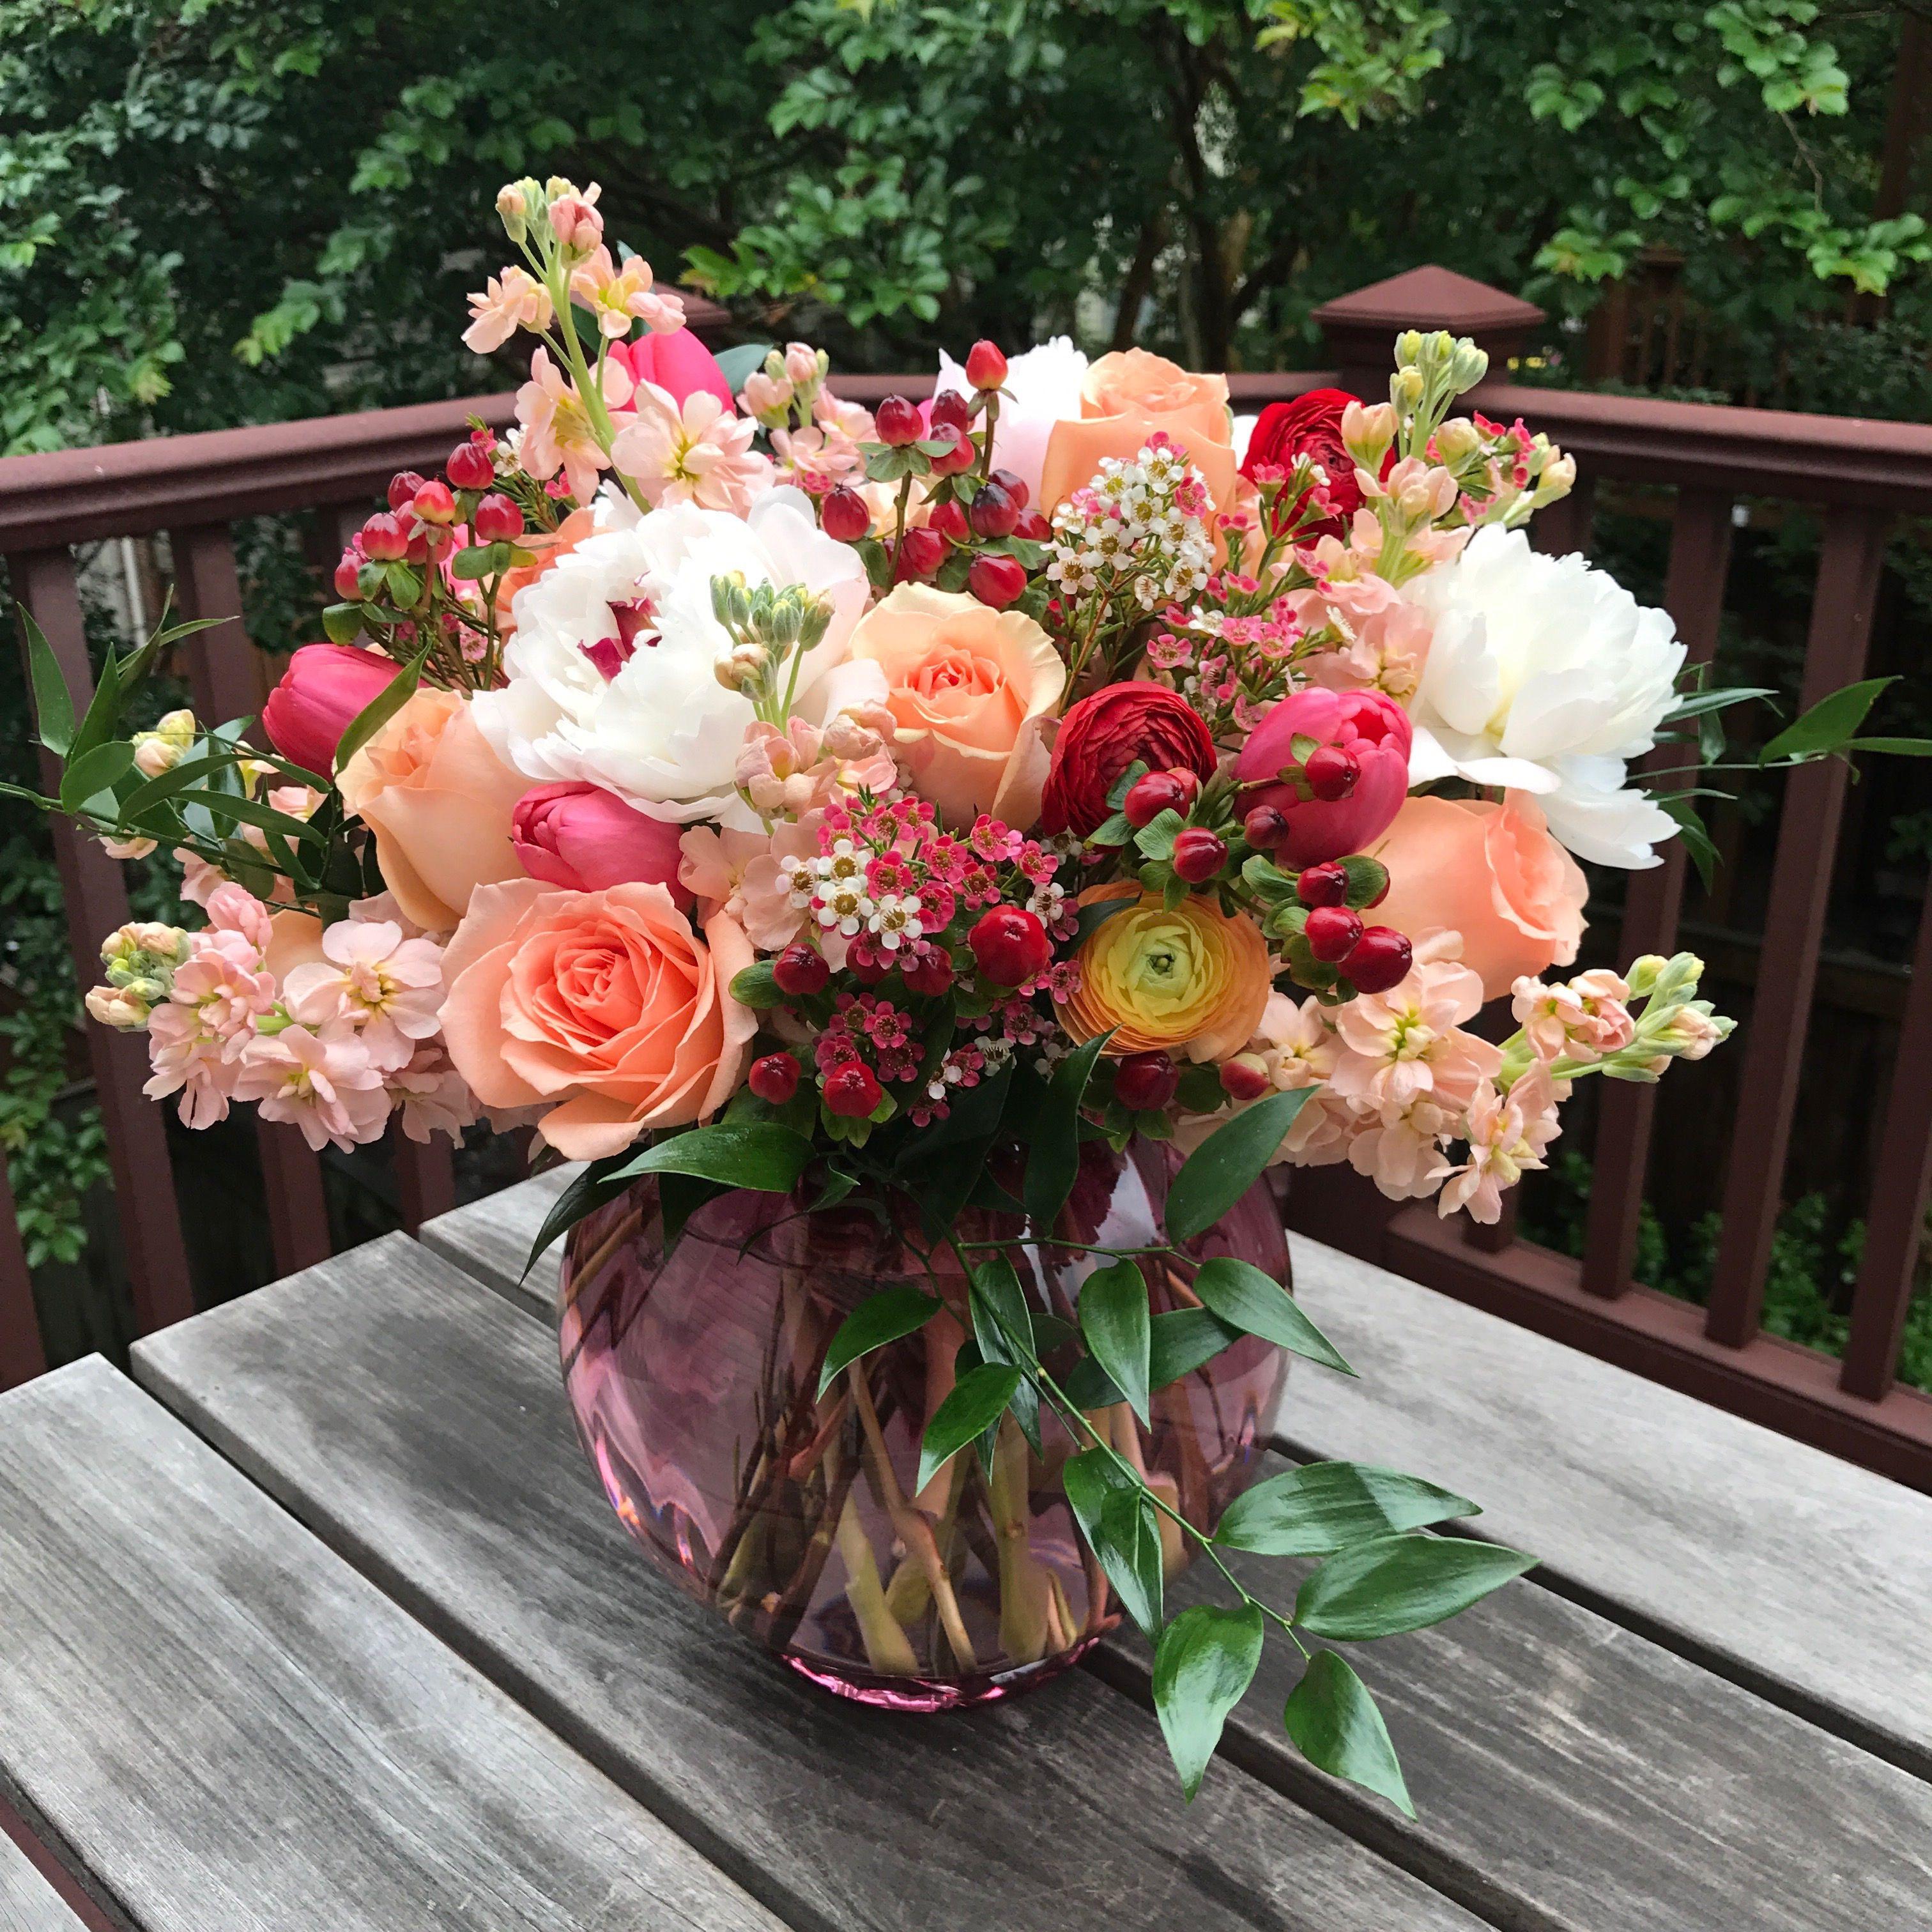 Wedding Anniversary Flower Bouquet With Peonies Roses Ranunculus Tulips Stock Hypericum Ber Flower Arrangements Fresh Flowers Arrangements Flowers Bouquet